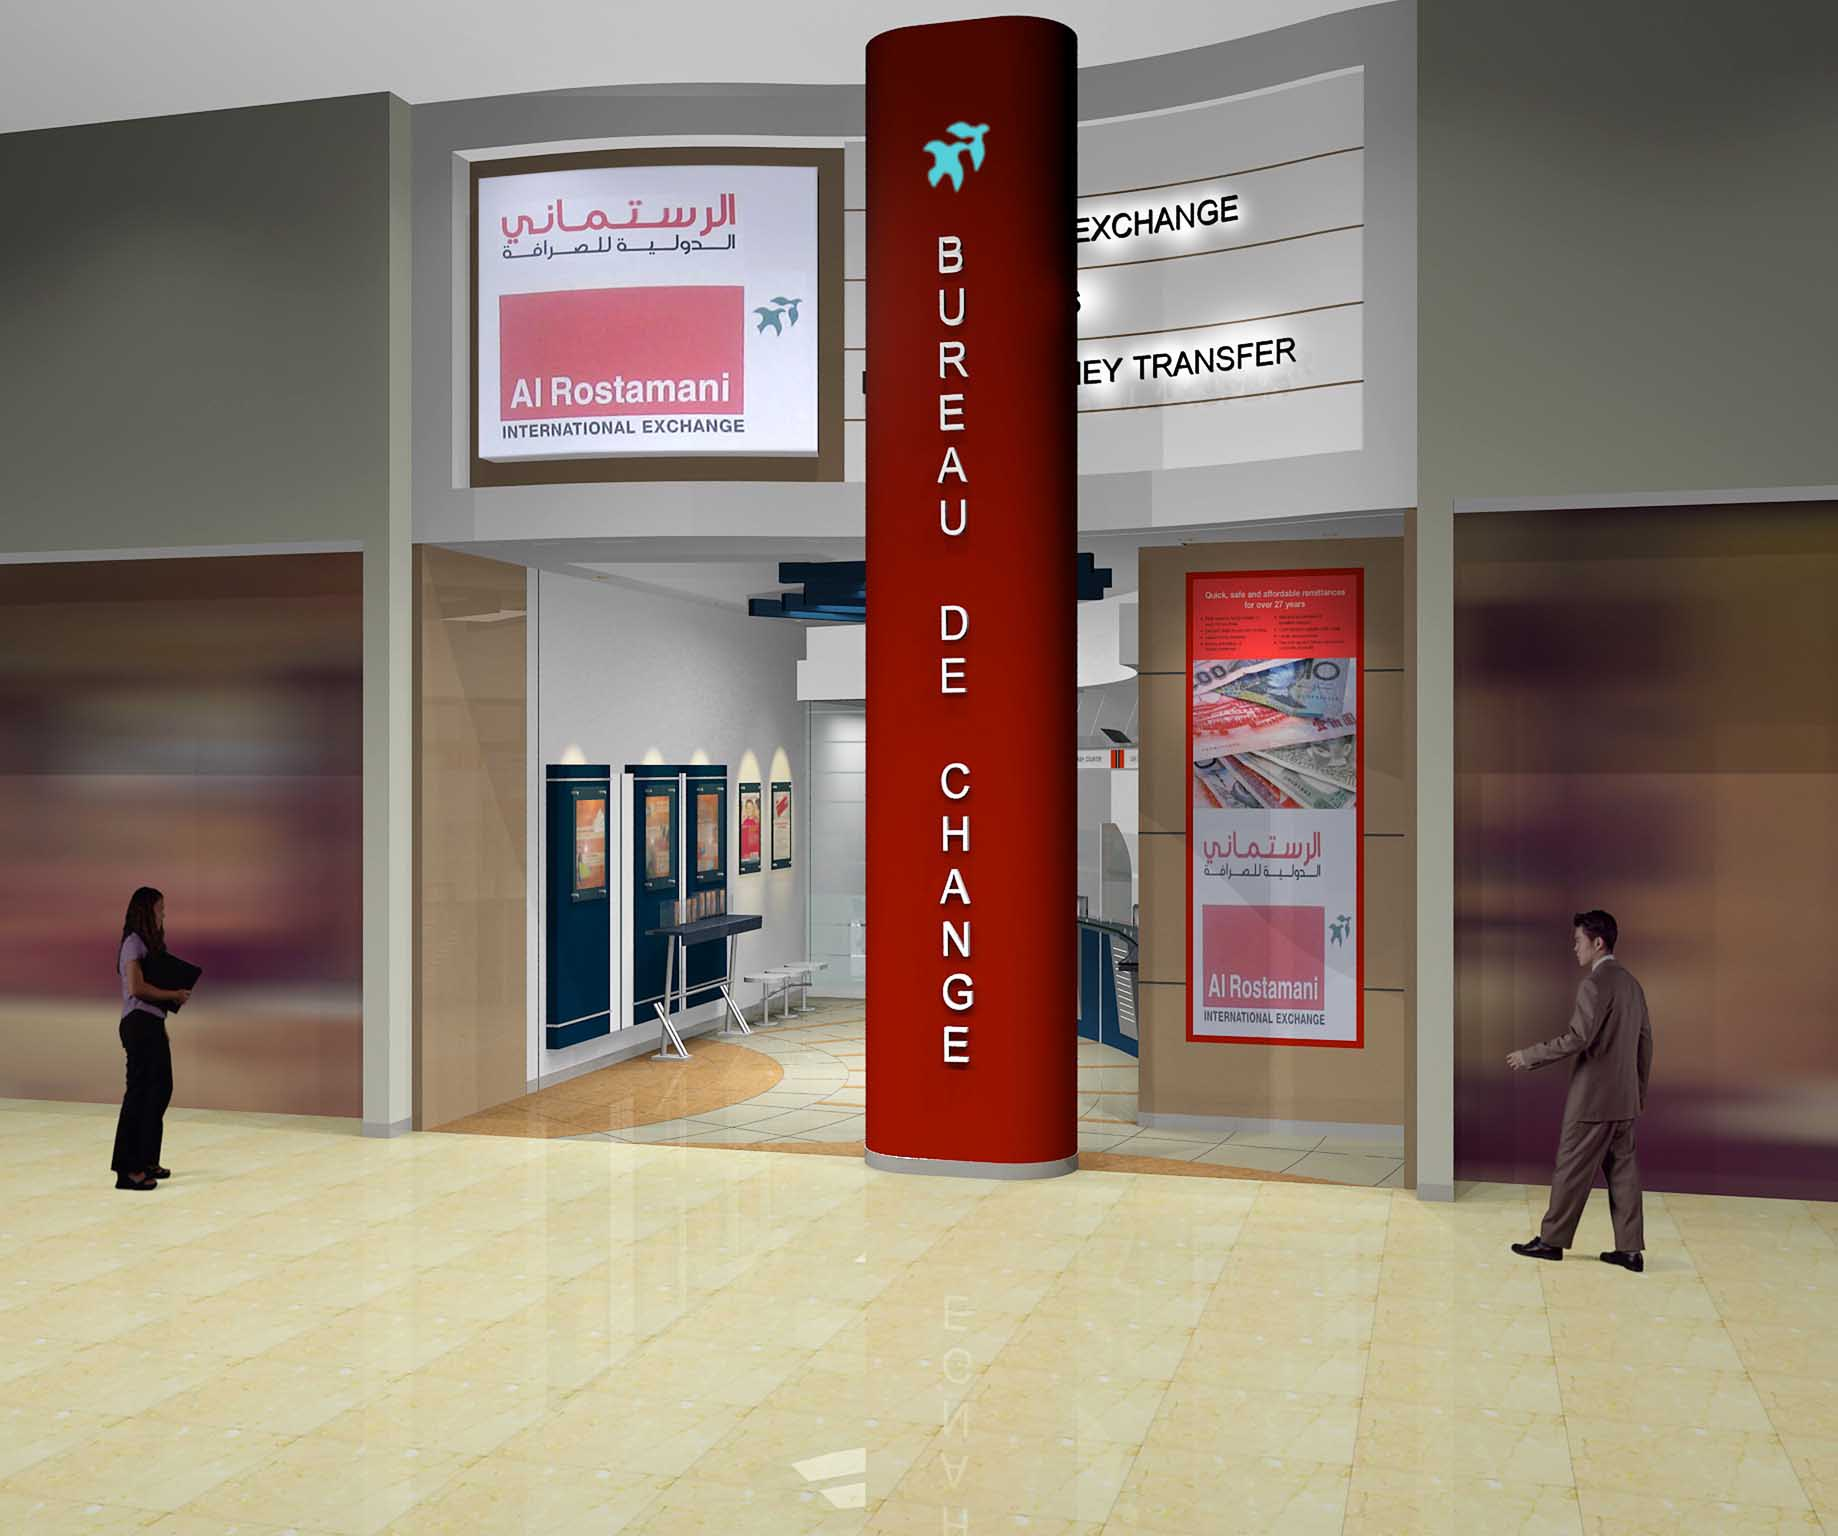 Al Rostamani International Exchange   Dubai Shopping Guide